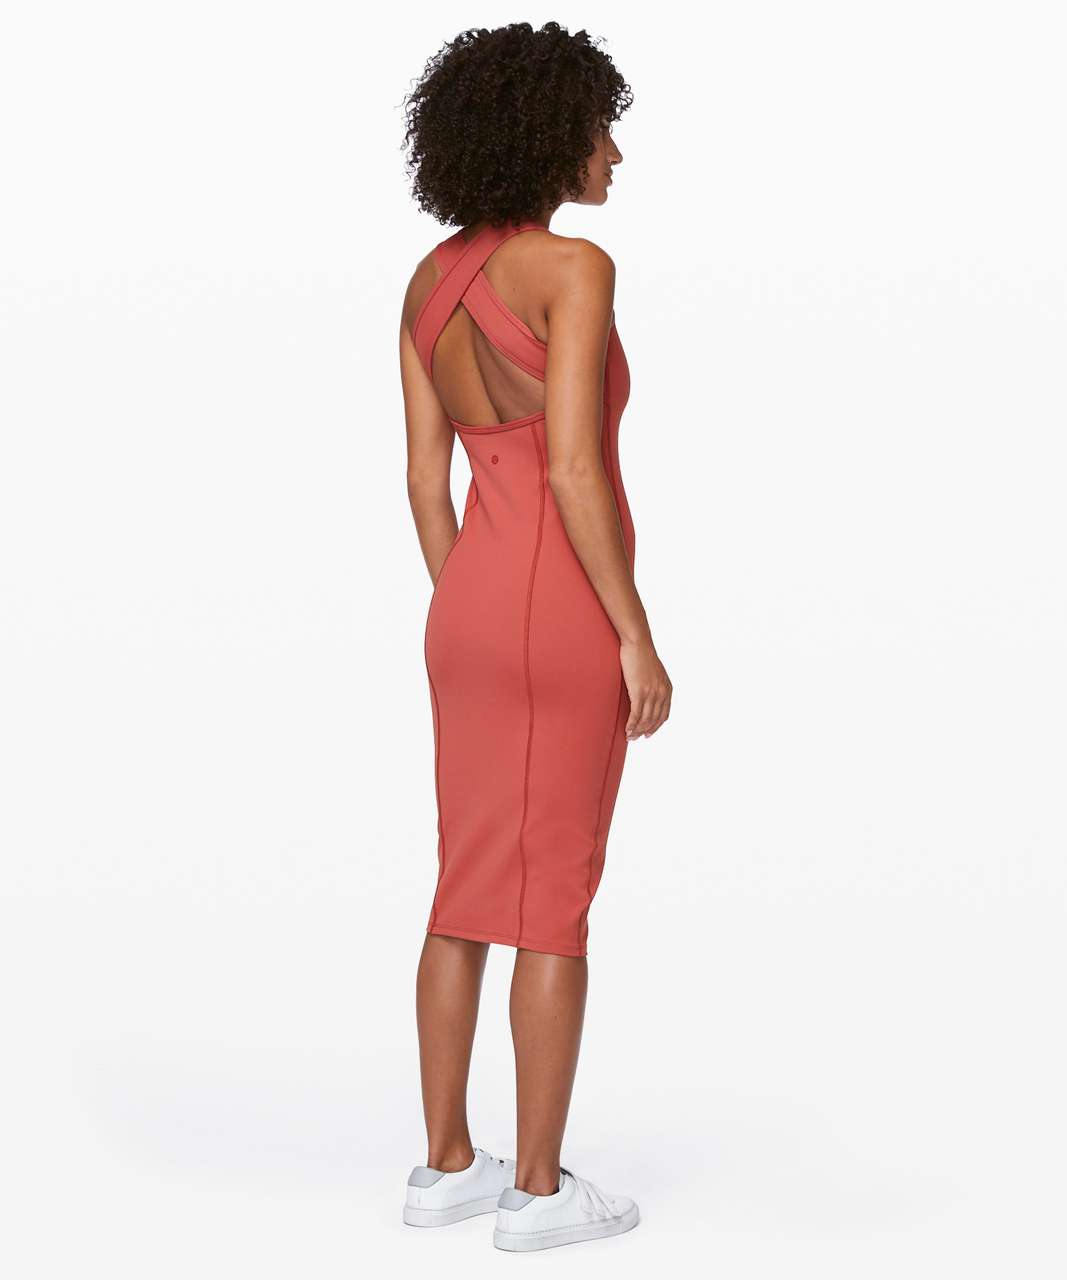 100070f84eccca Lululemon Picnic Play Dress - Brick Rose - lulu fanatics